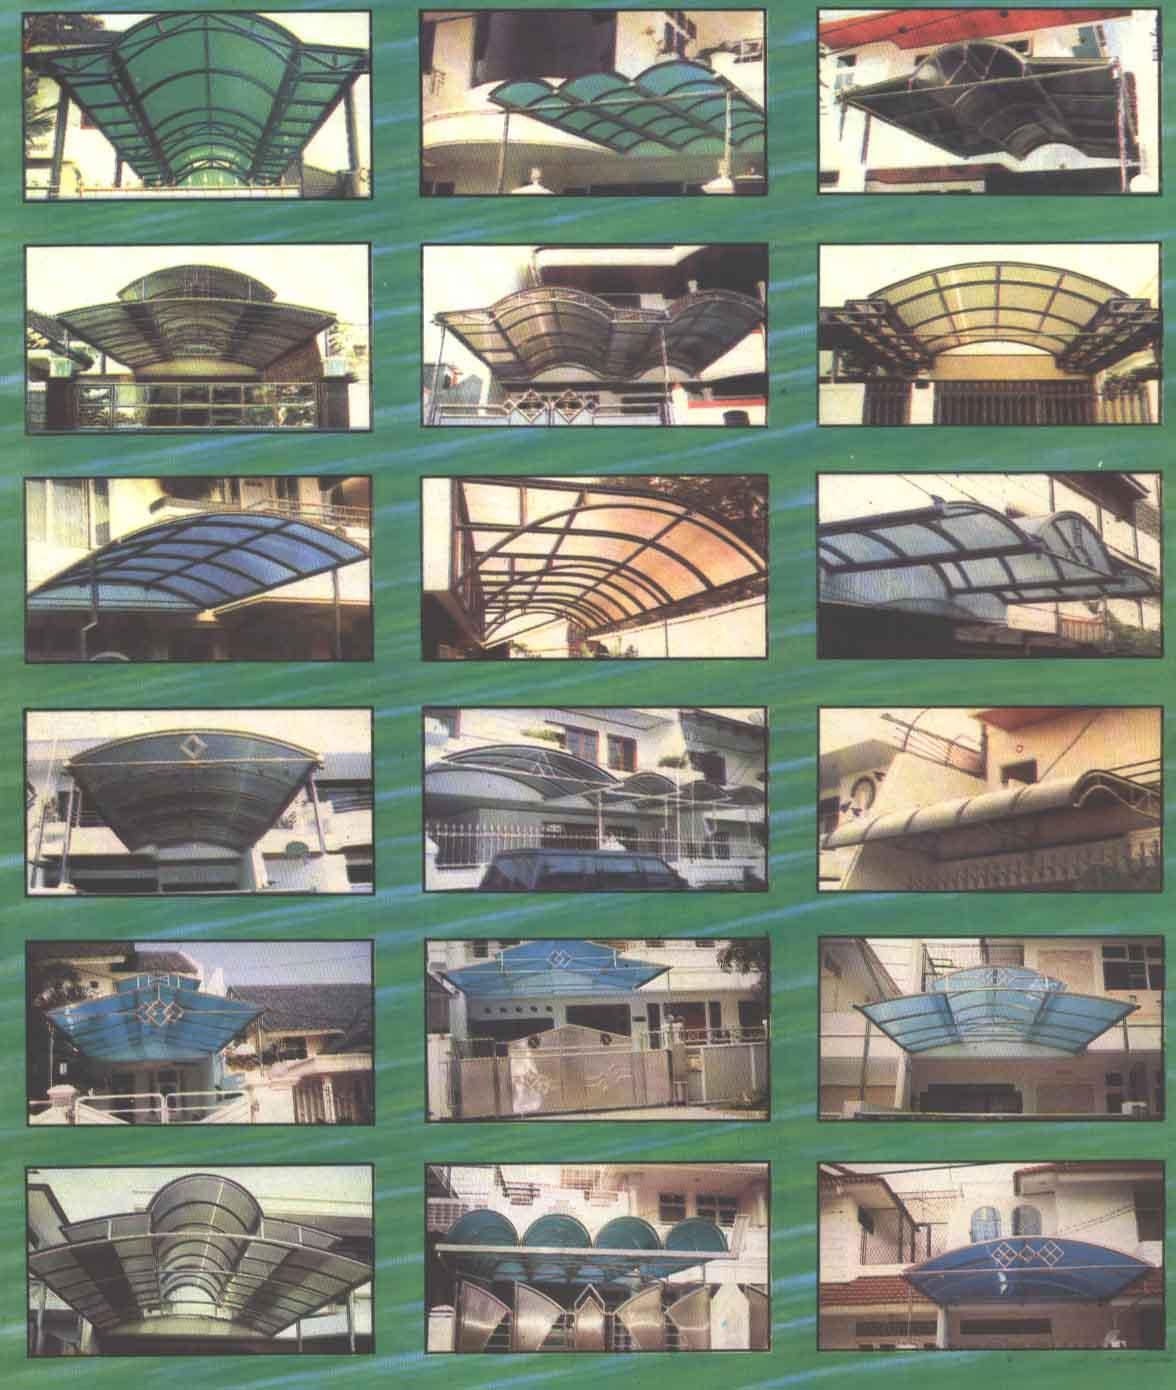 jenis dan harga baja ringan canopy | hasta karya